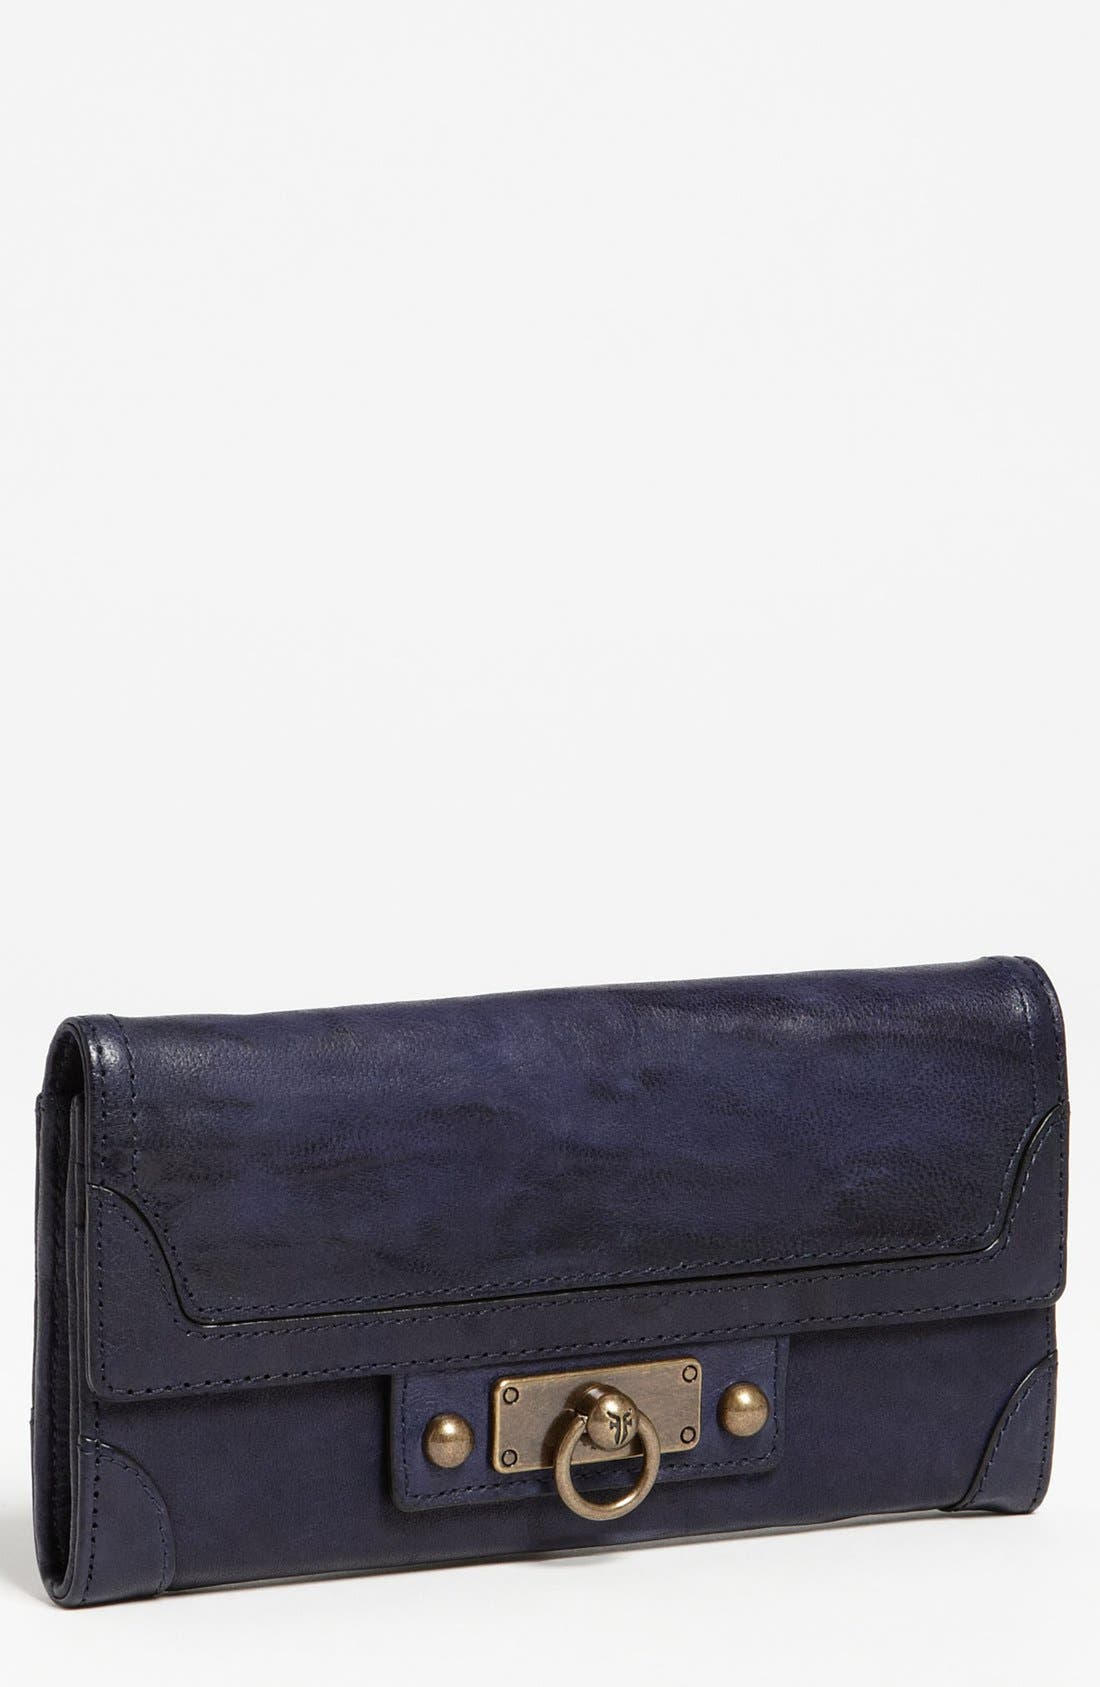 Alternate Image 1 Selected - Frye 'Cameron - Large' Wallet